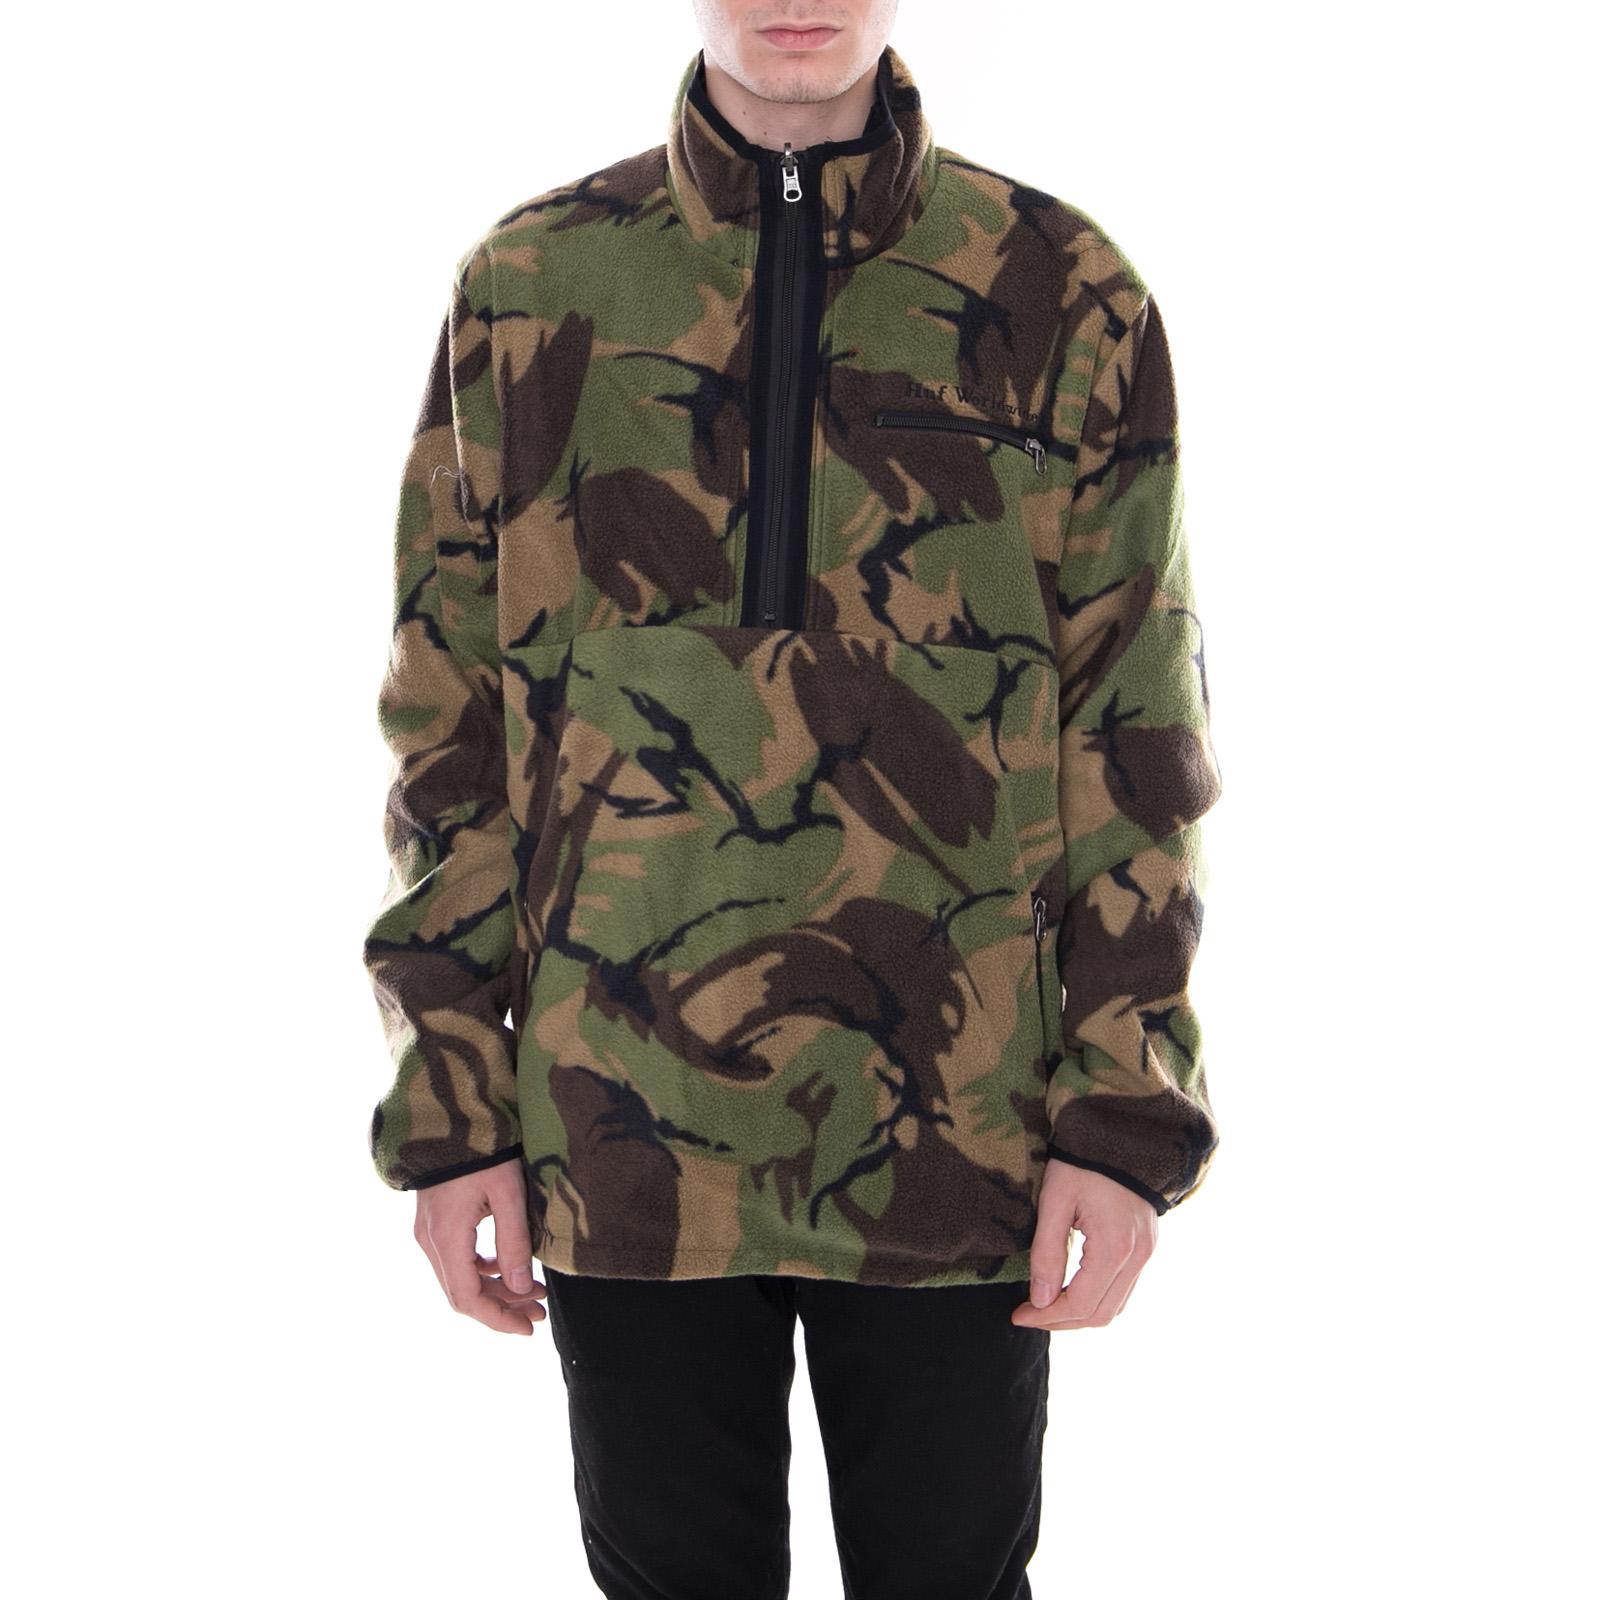 Jacket Noir Huf 1 Vestes Noir Zip Kumo Réversibles 4 qwAwR4F